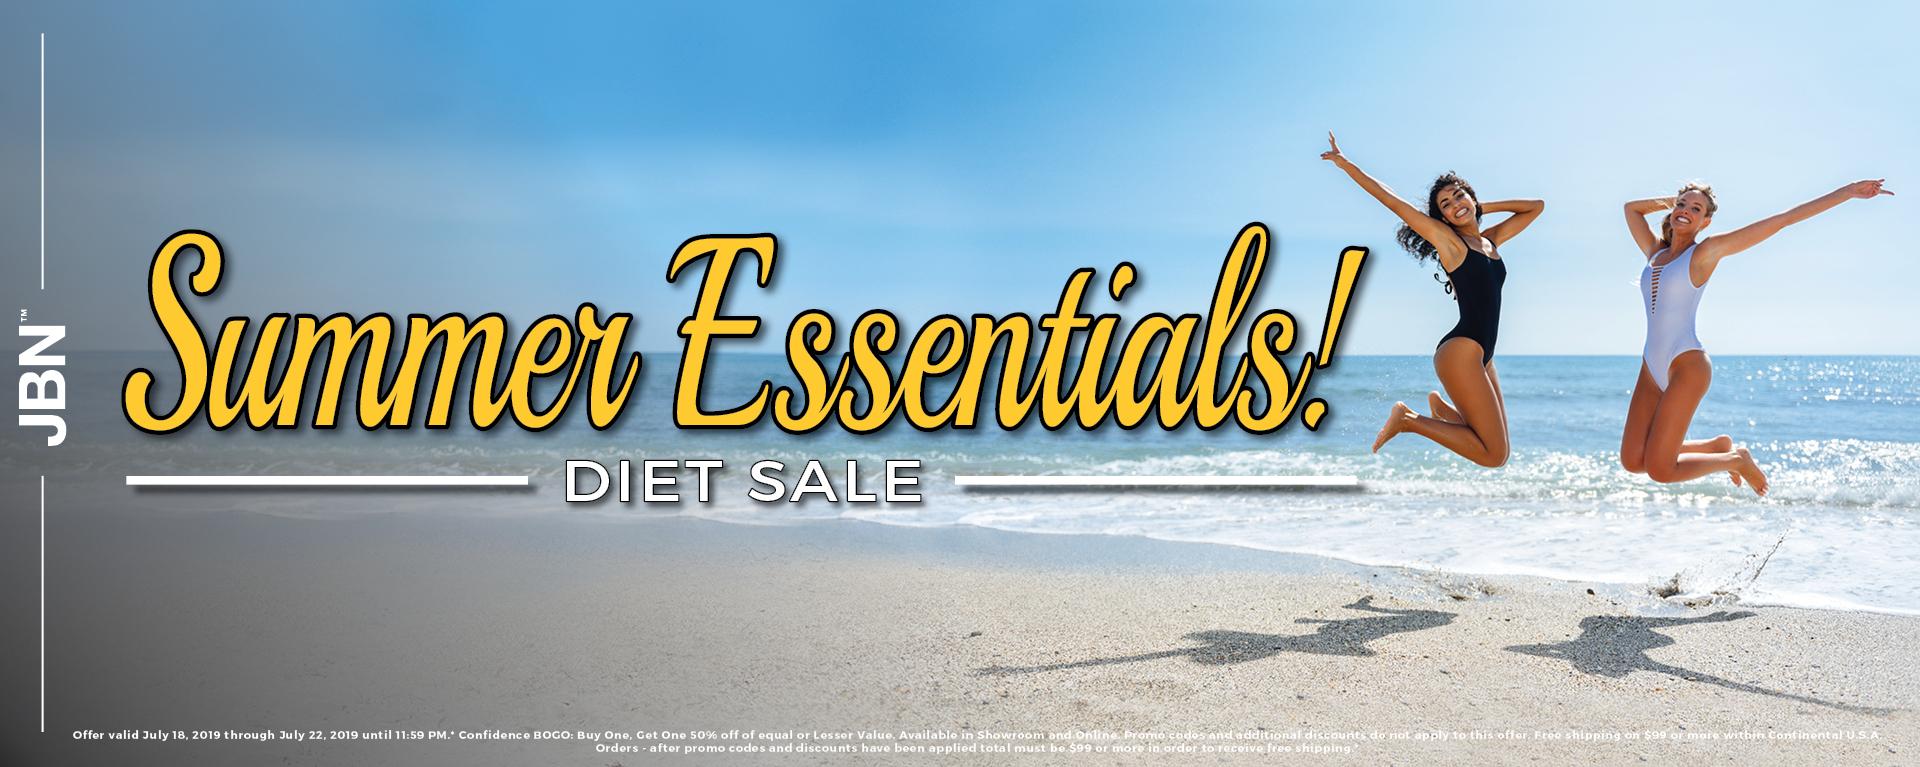 summer-essentials-719-2.jpeg